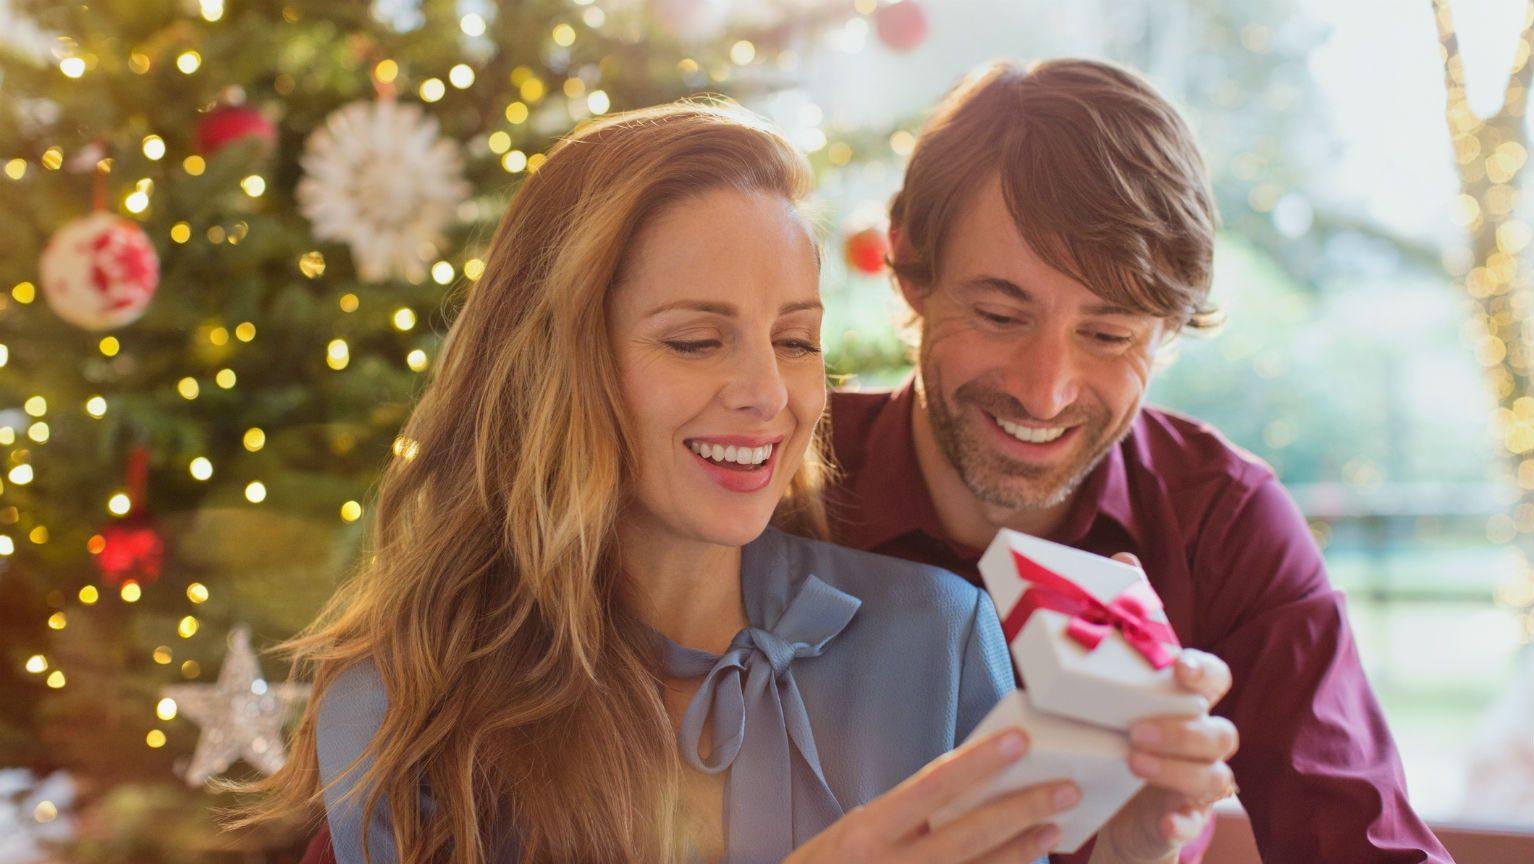 Husband giving wife Christmas gift